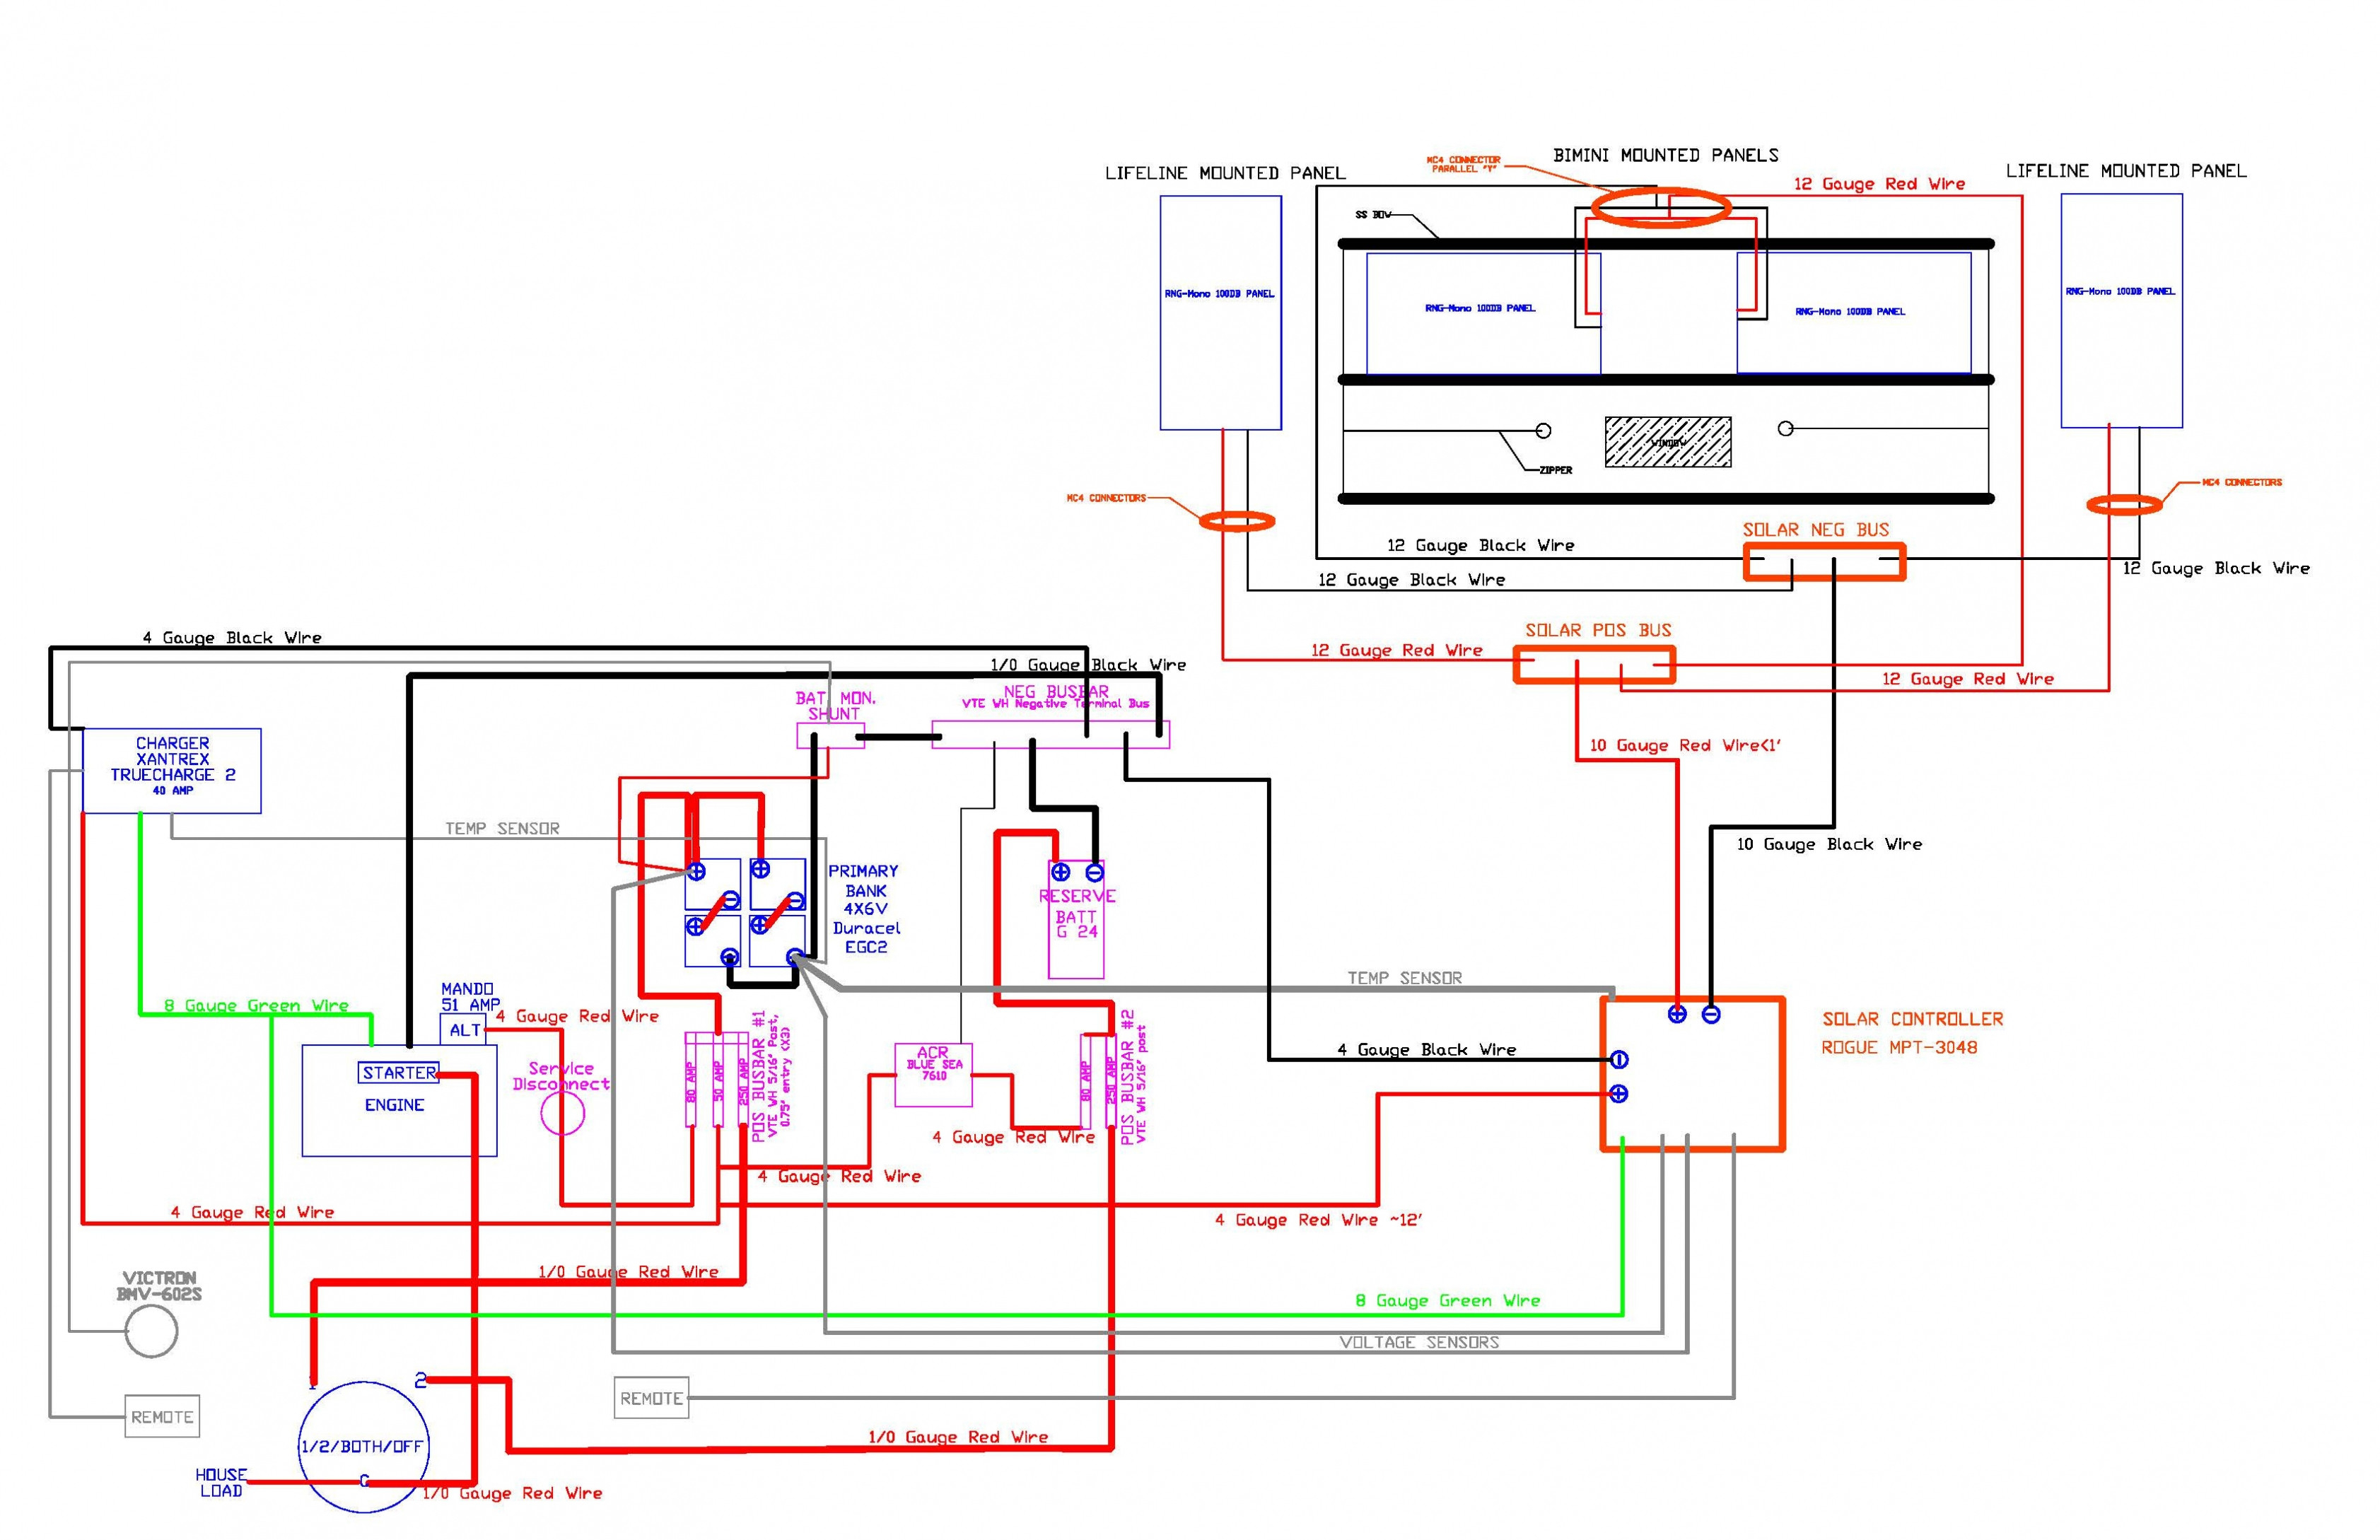 Rv Solar Panel Installation Wiring Diagram Example Of Solar Panel - Rv Solar Panel Installation Wiring Diagram